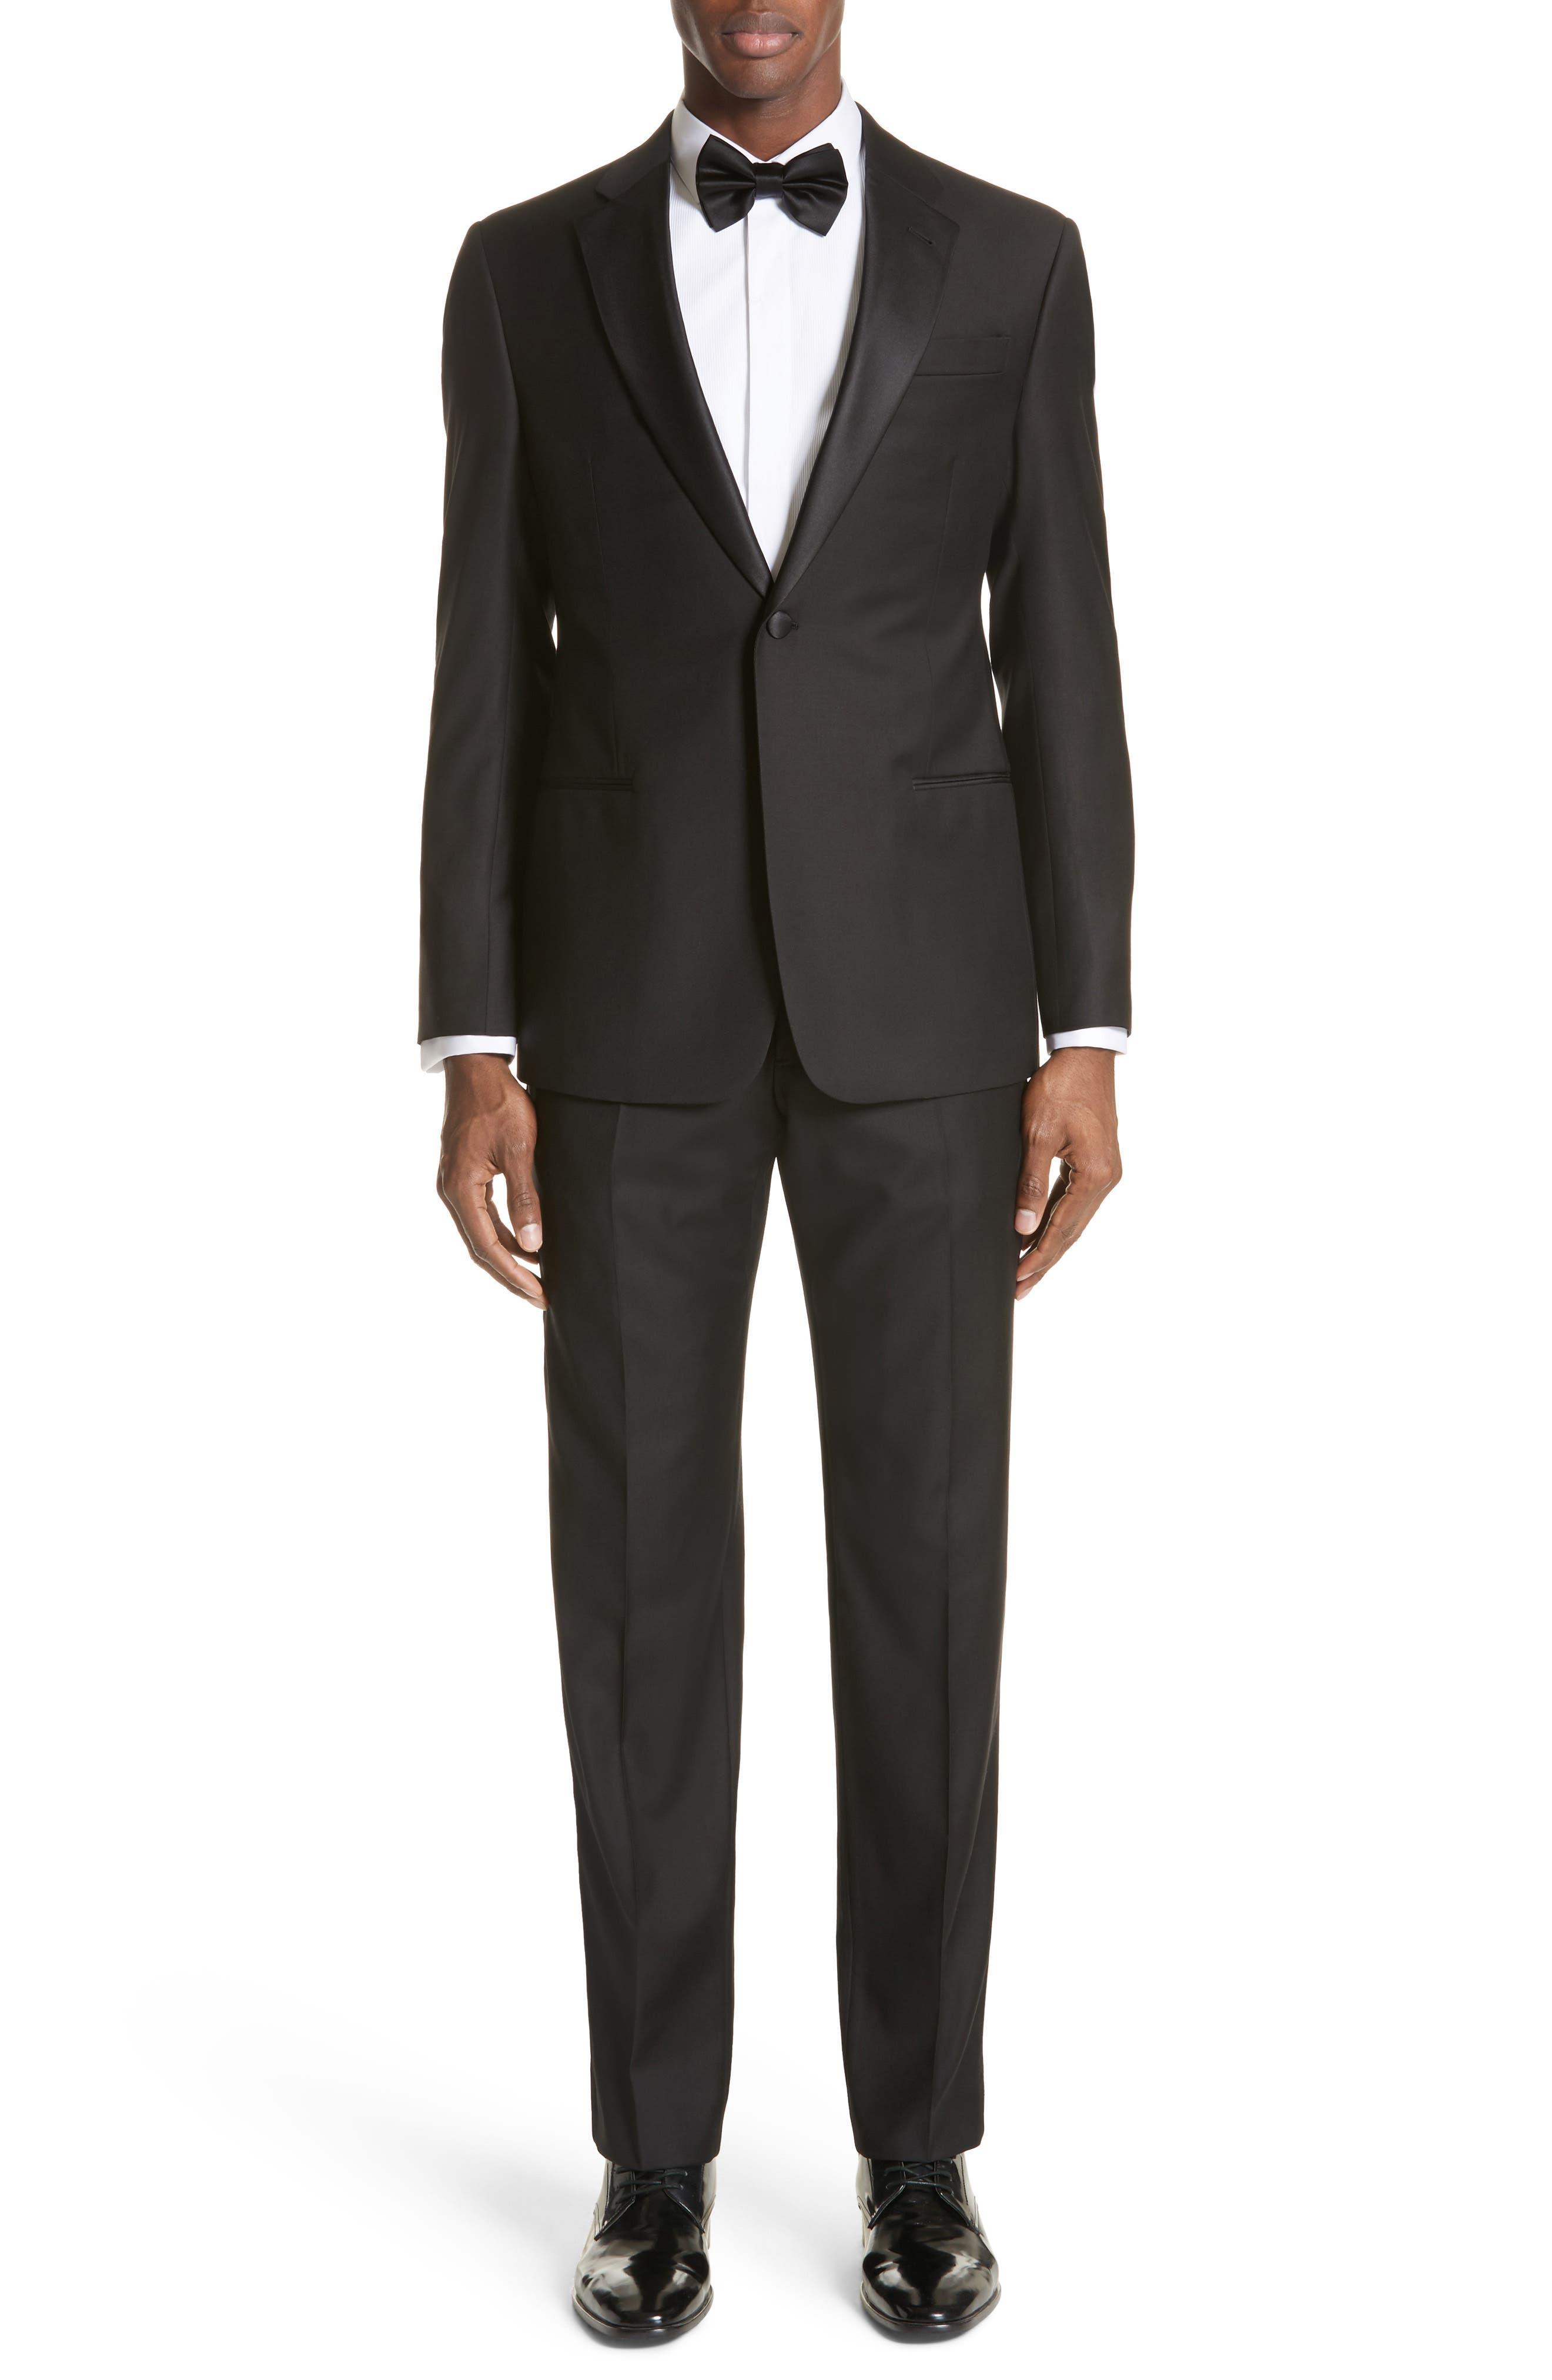 EMPORIO ARMANI, Trim Fit Wool Tuxedo, Main thumbnail 1, color, BLACK